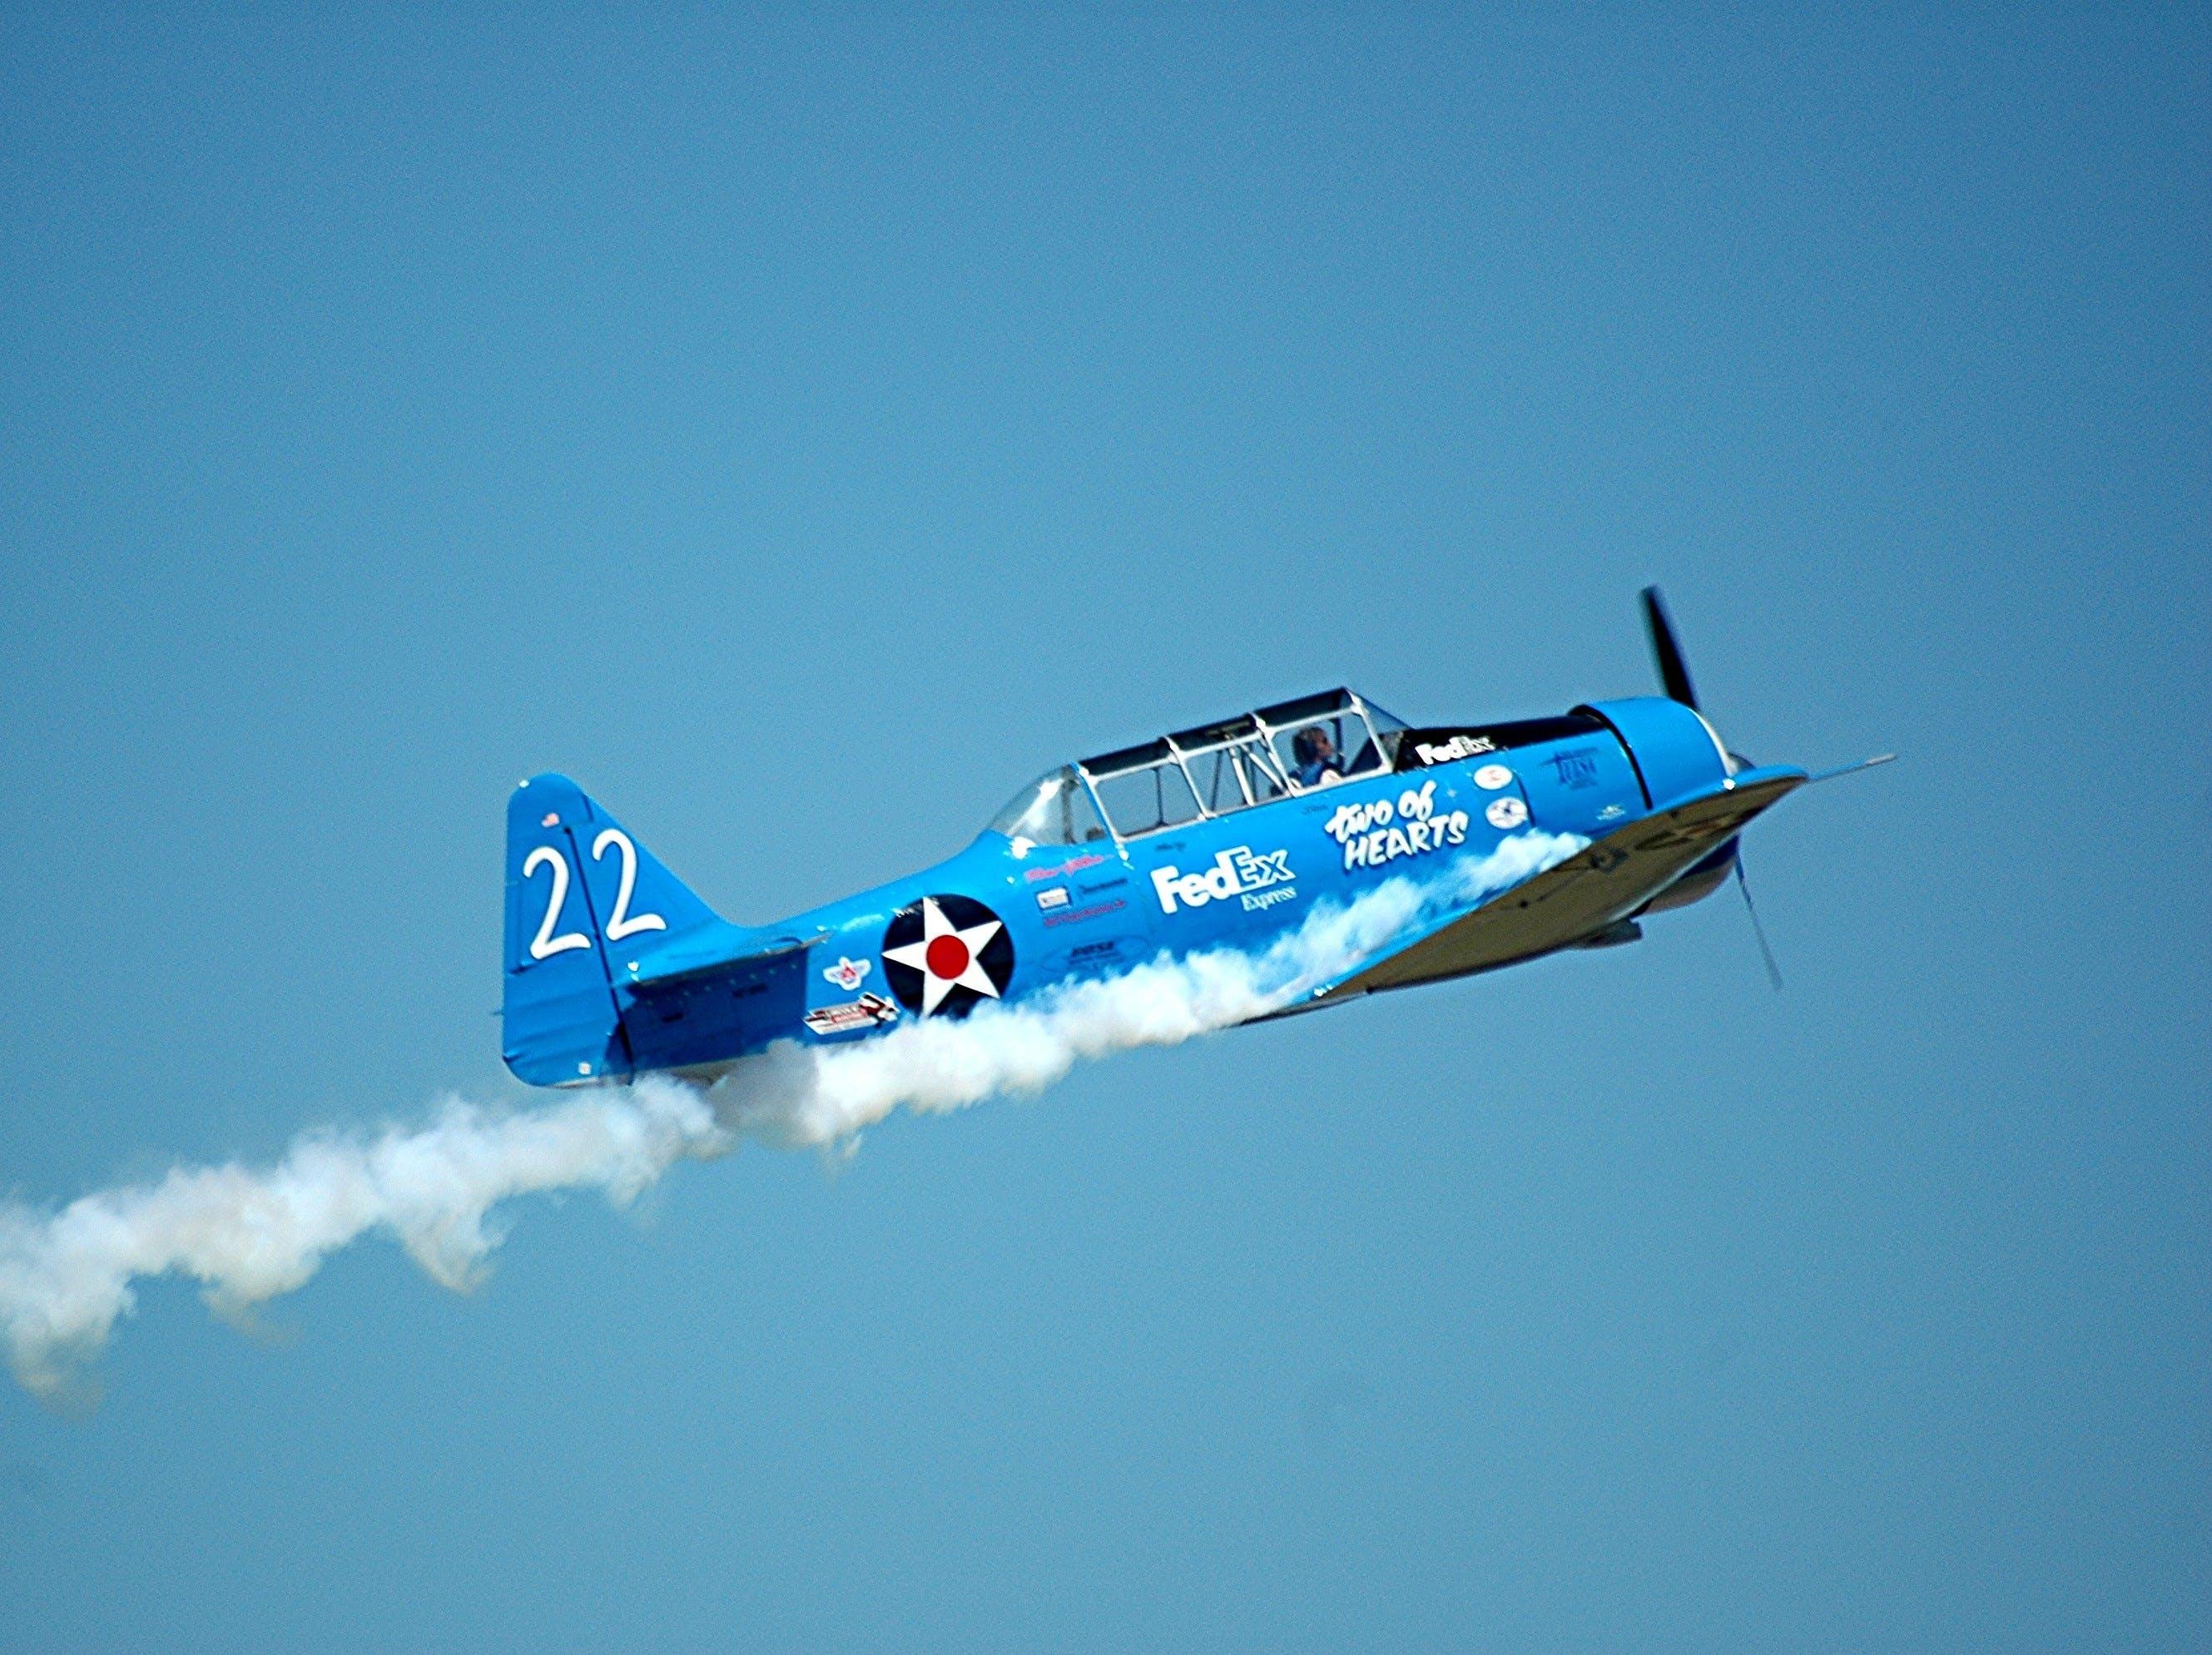 Free stock photo of flight, sky, blue, event